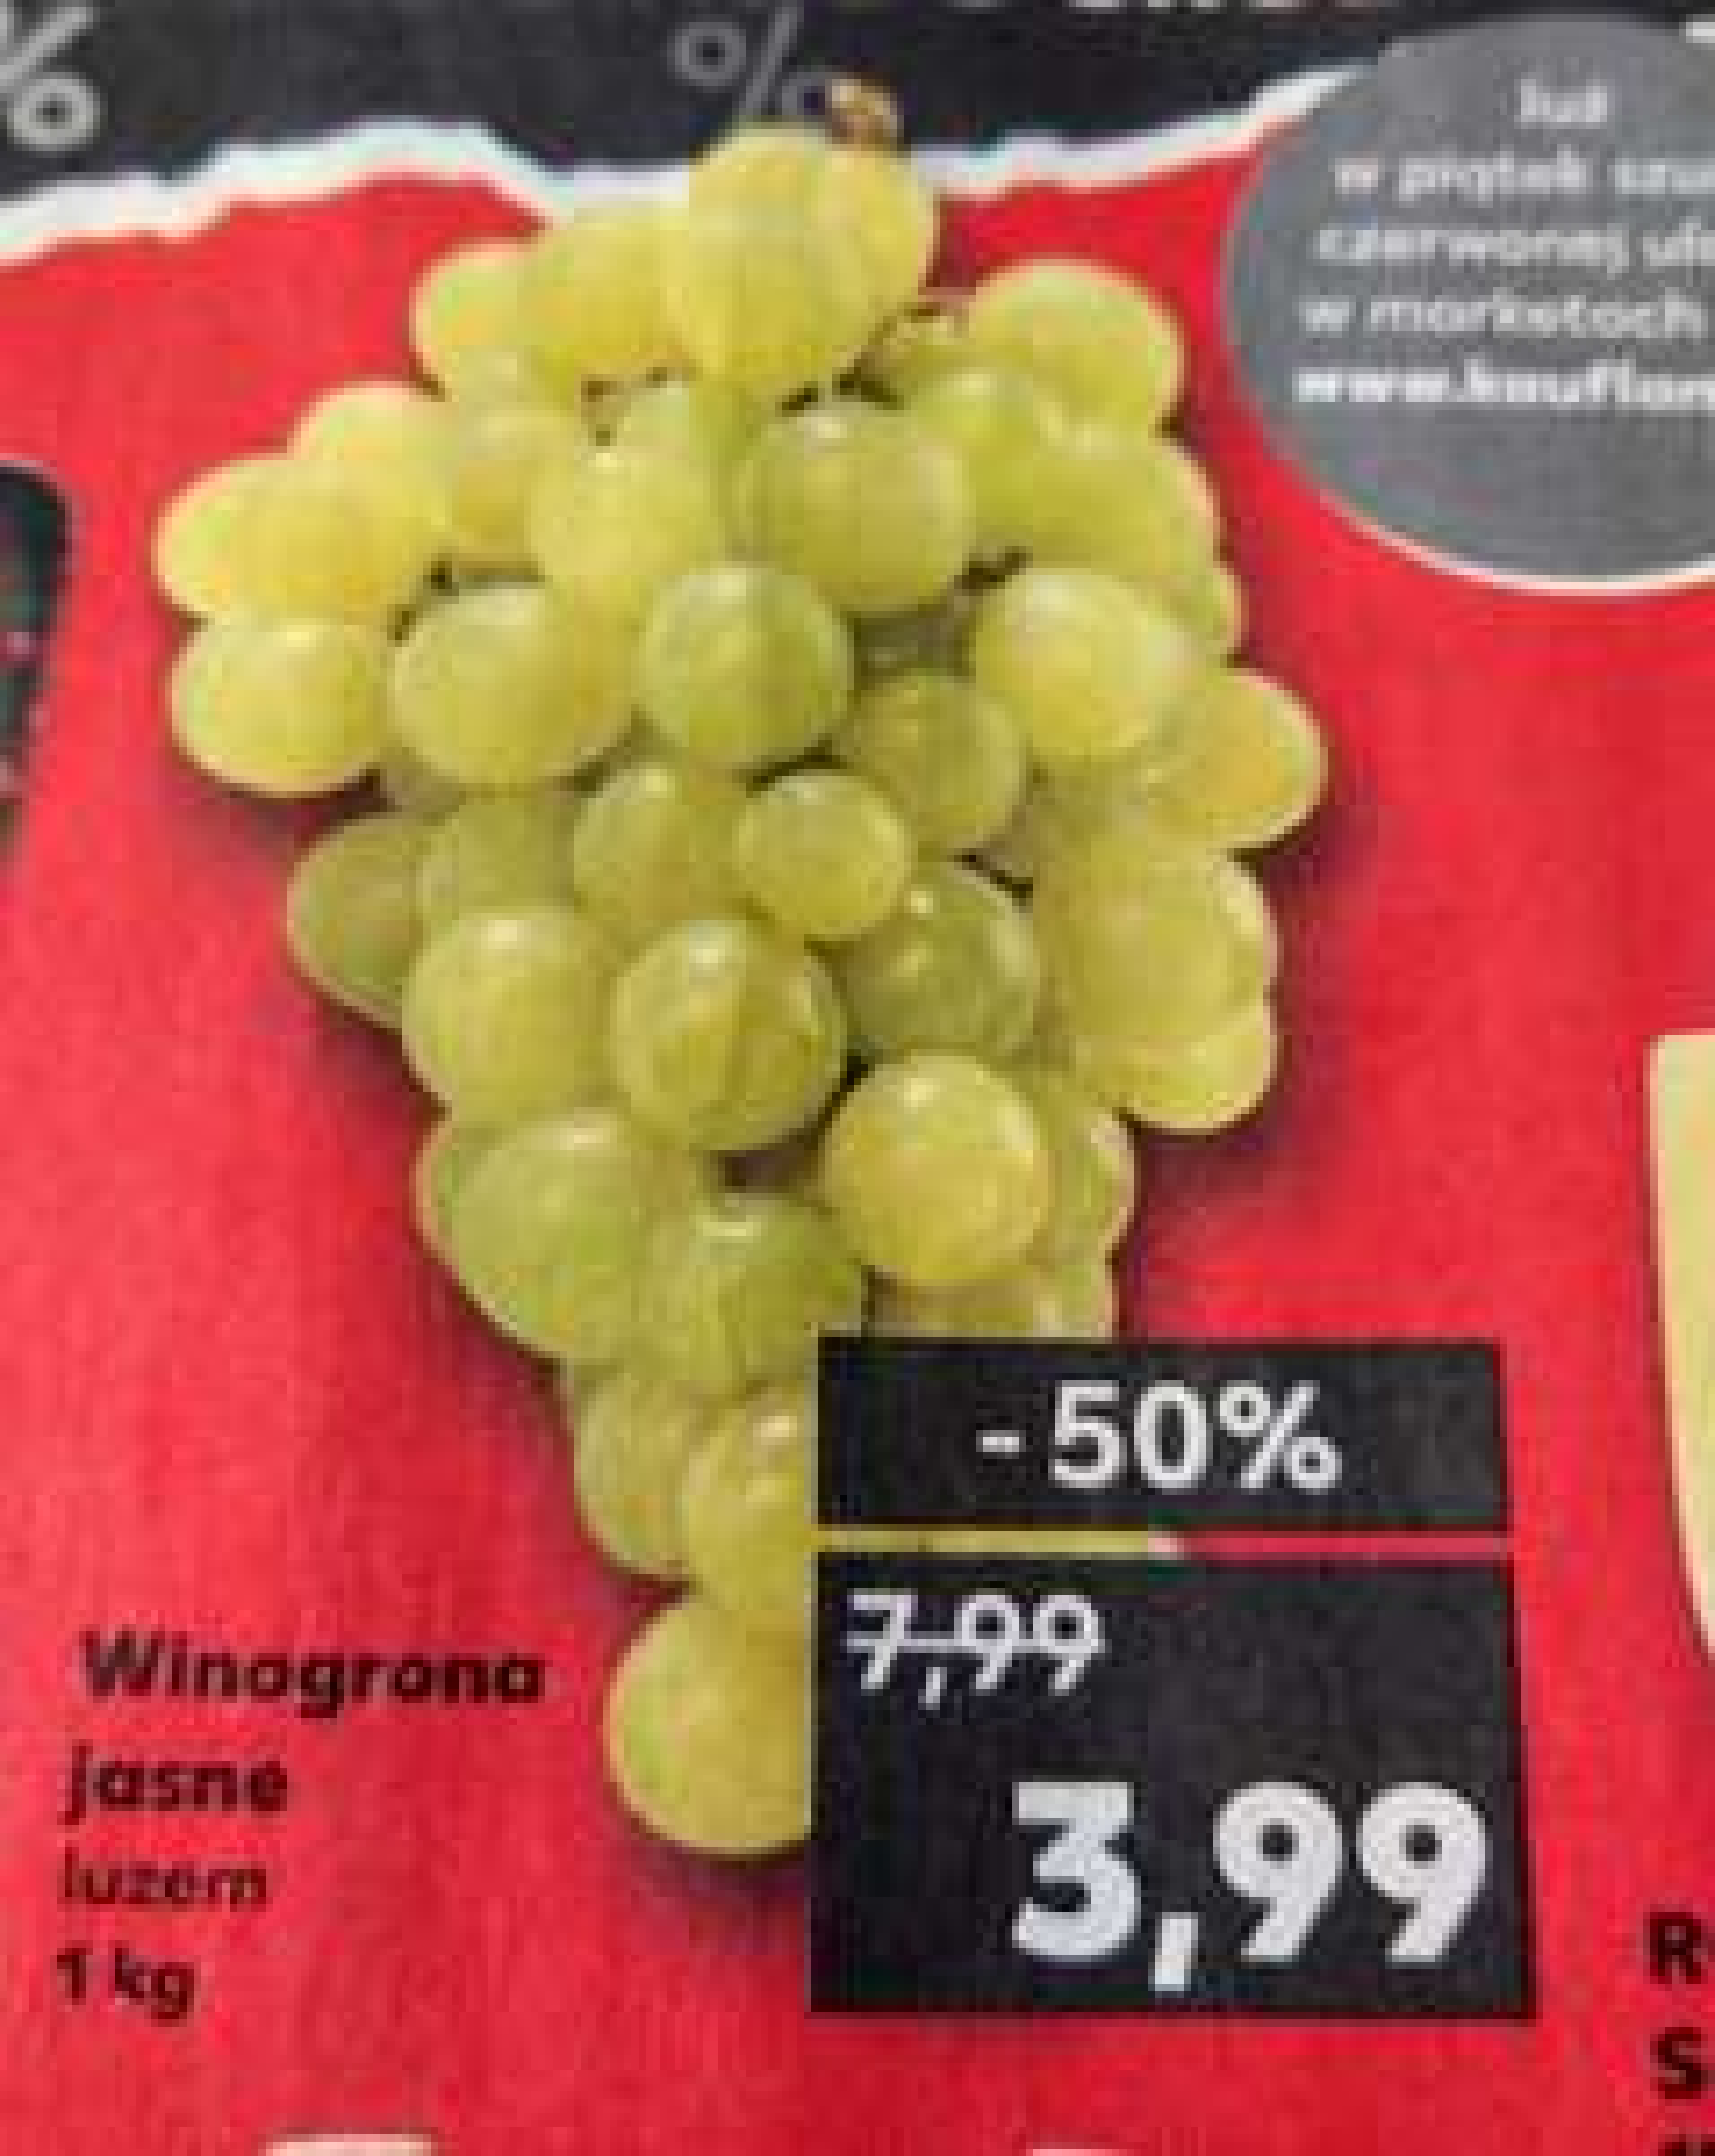 Winogrono jasne 1kg - Kaufland